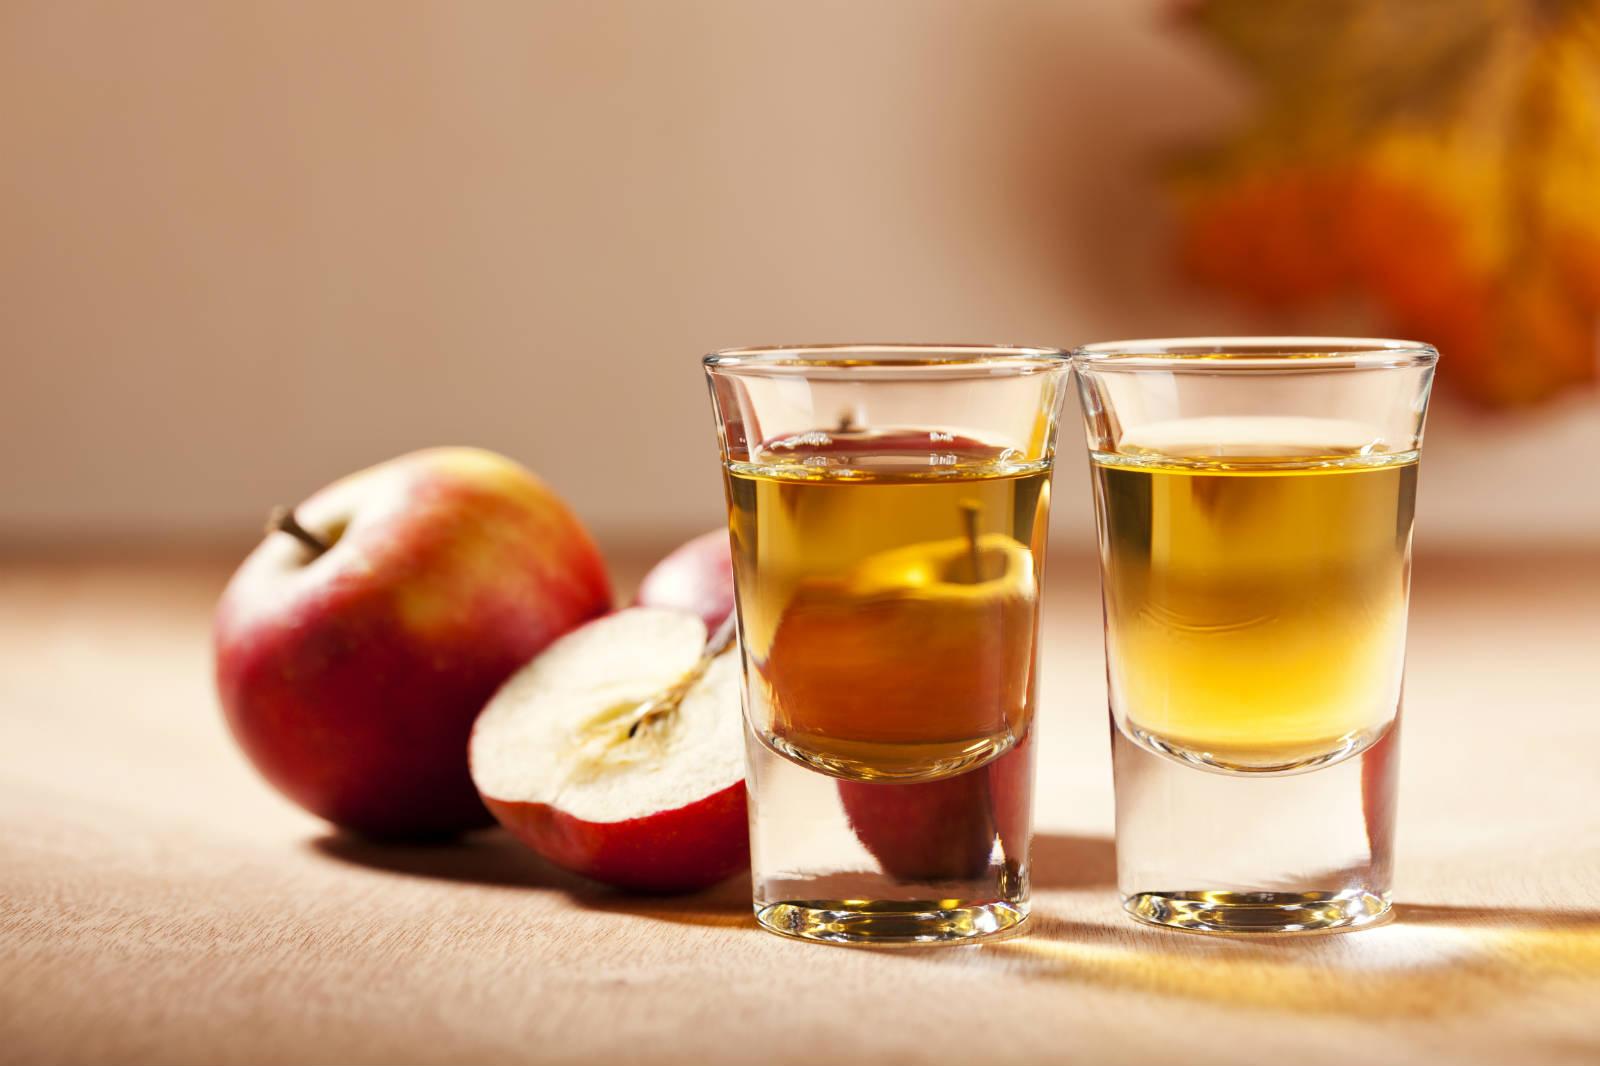 33 Health Benefits Of Apple Cider Vinegar